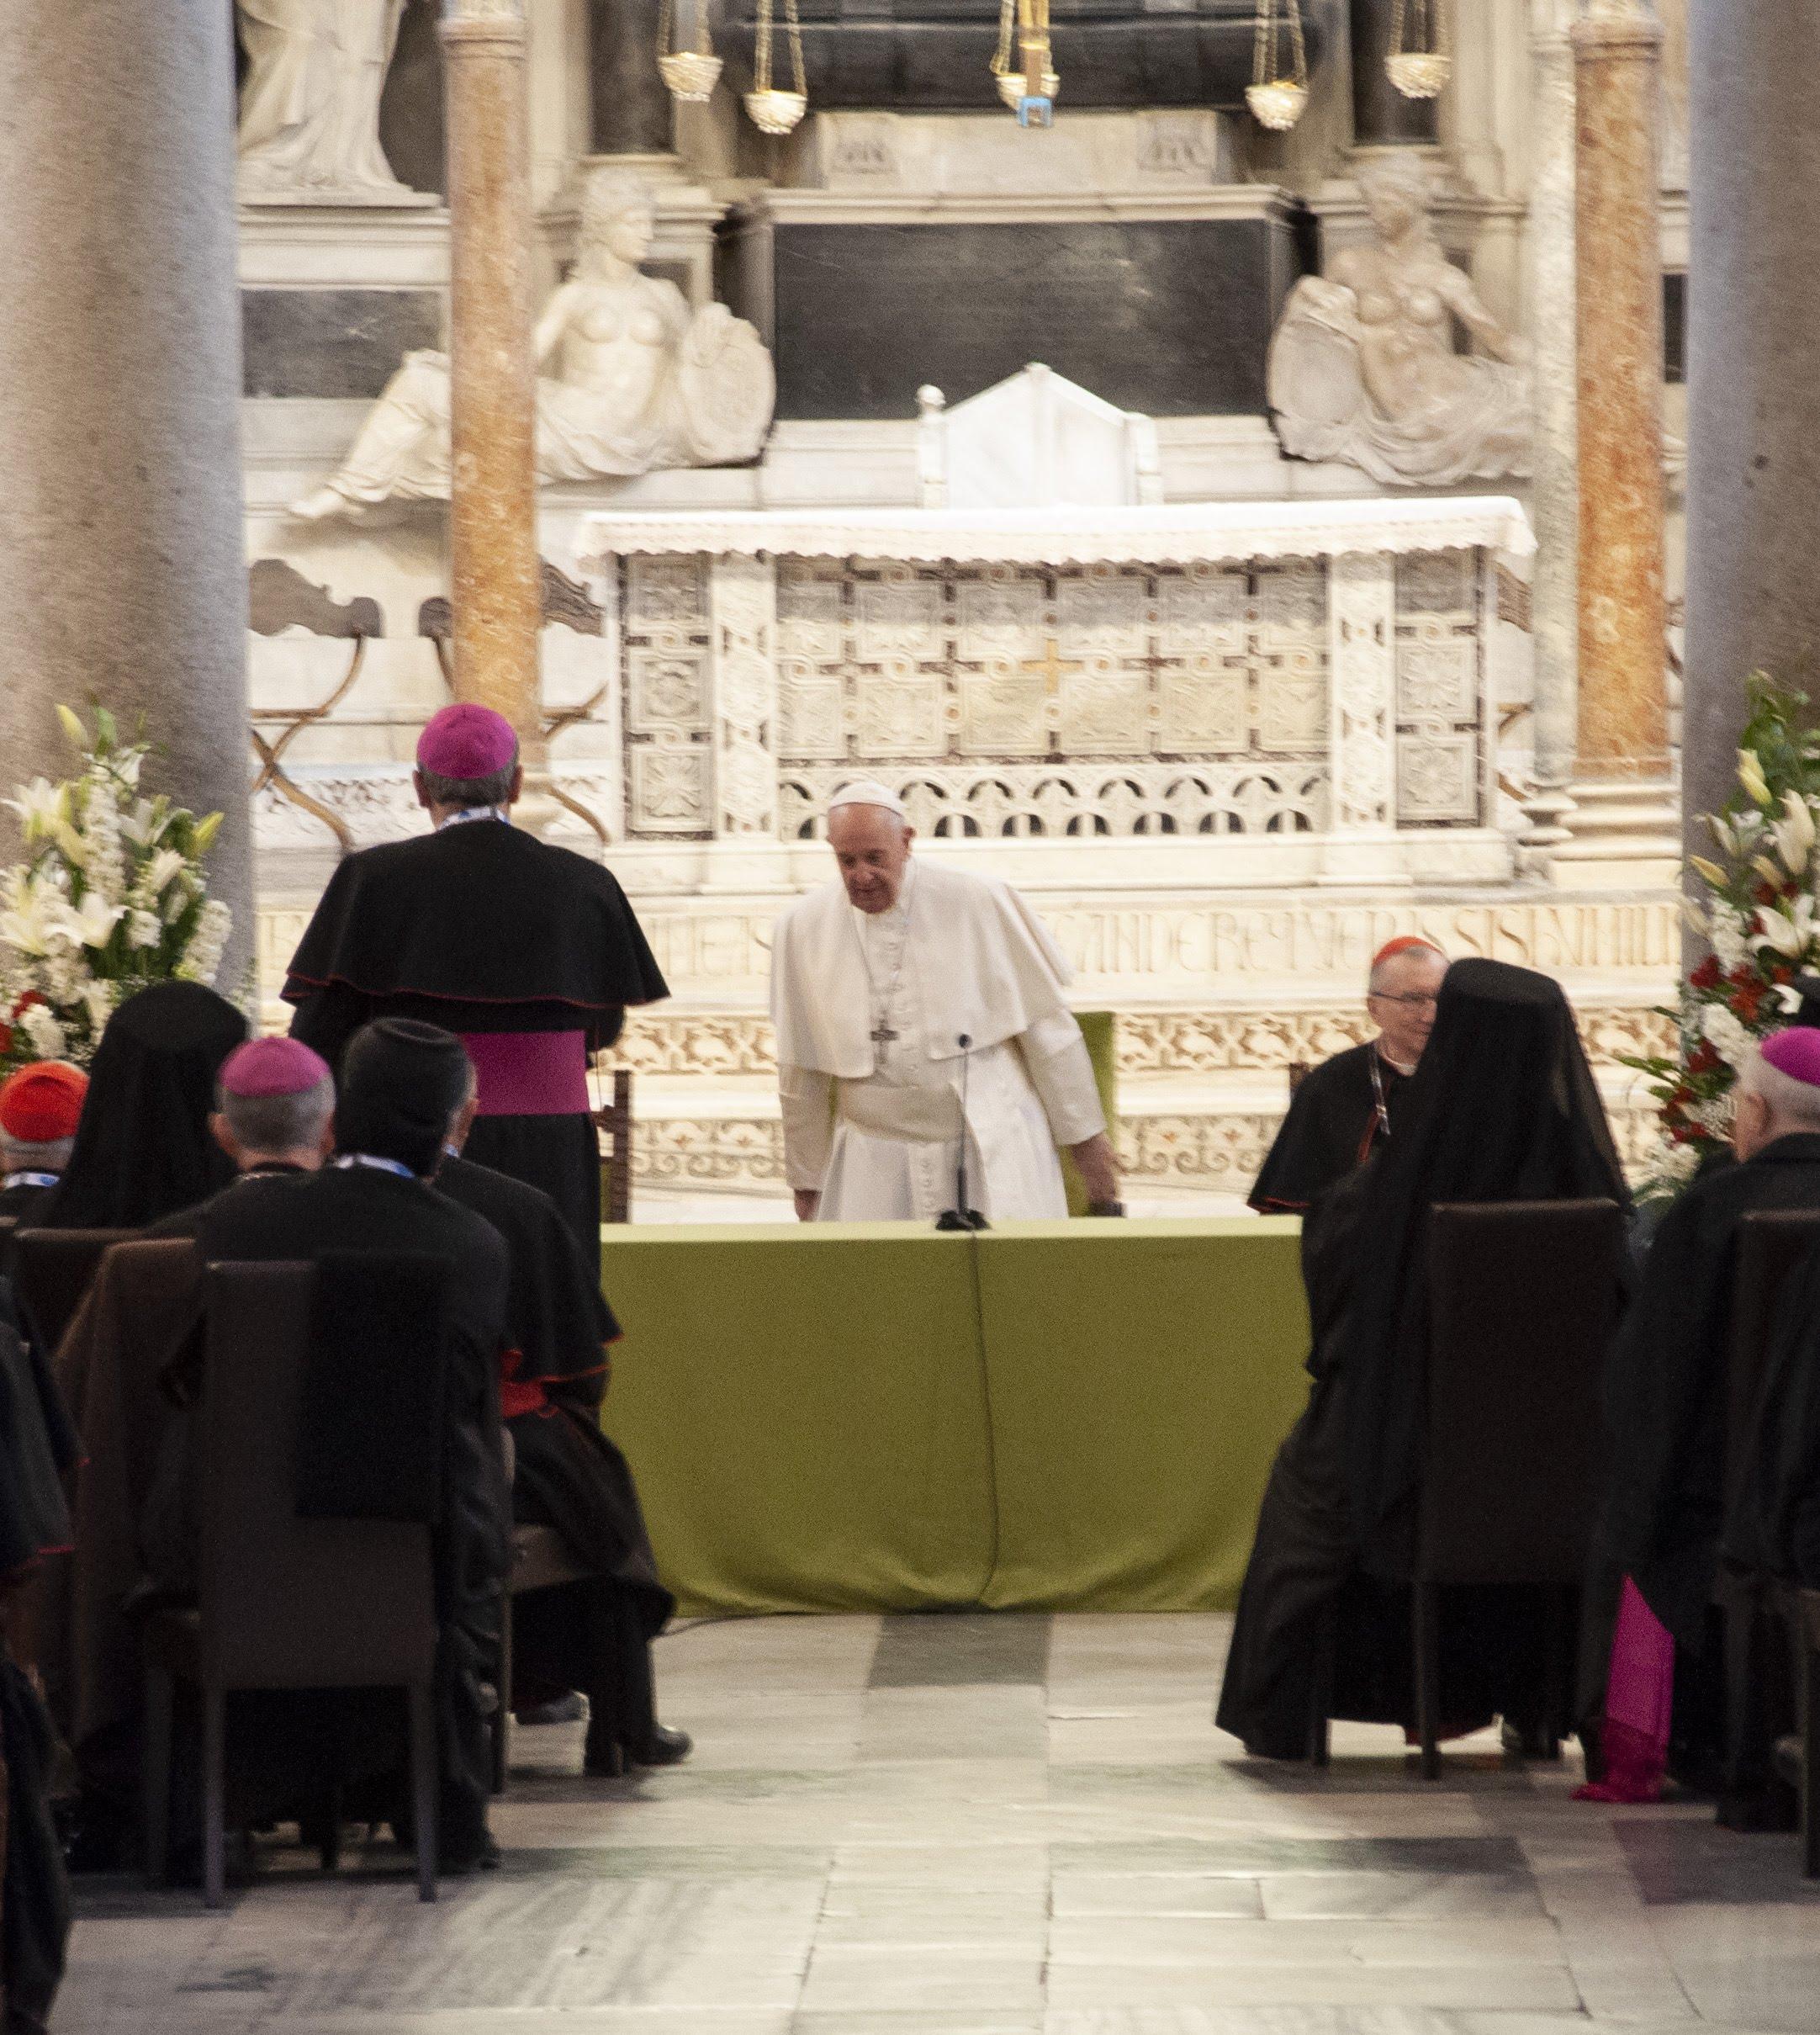 20200223 Bari Papa Francesco 115 (Copia di NXPowerLite).jpg